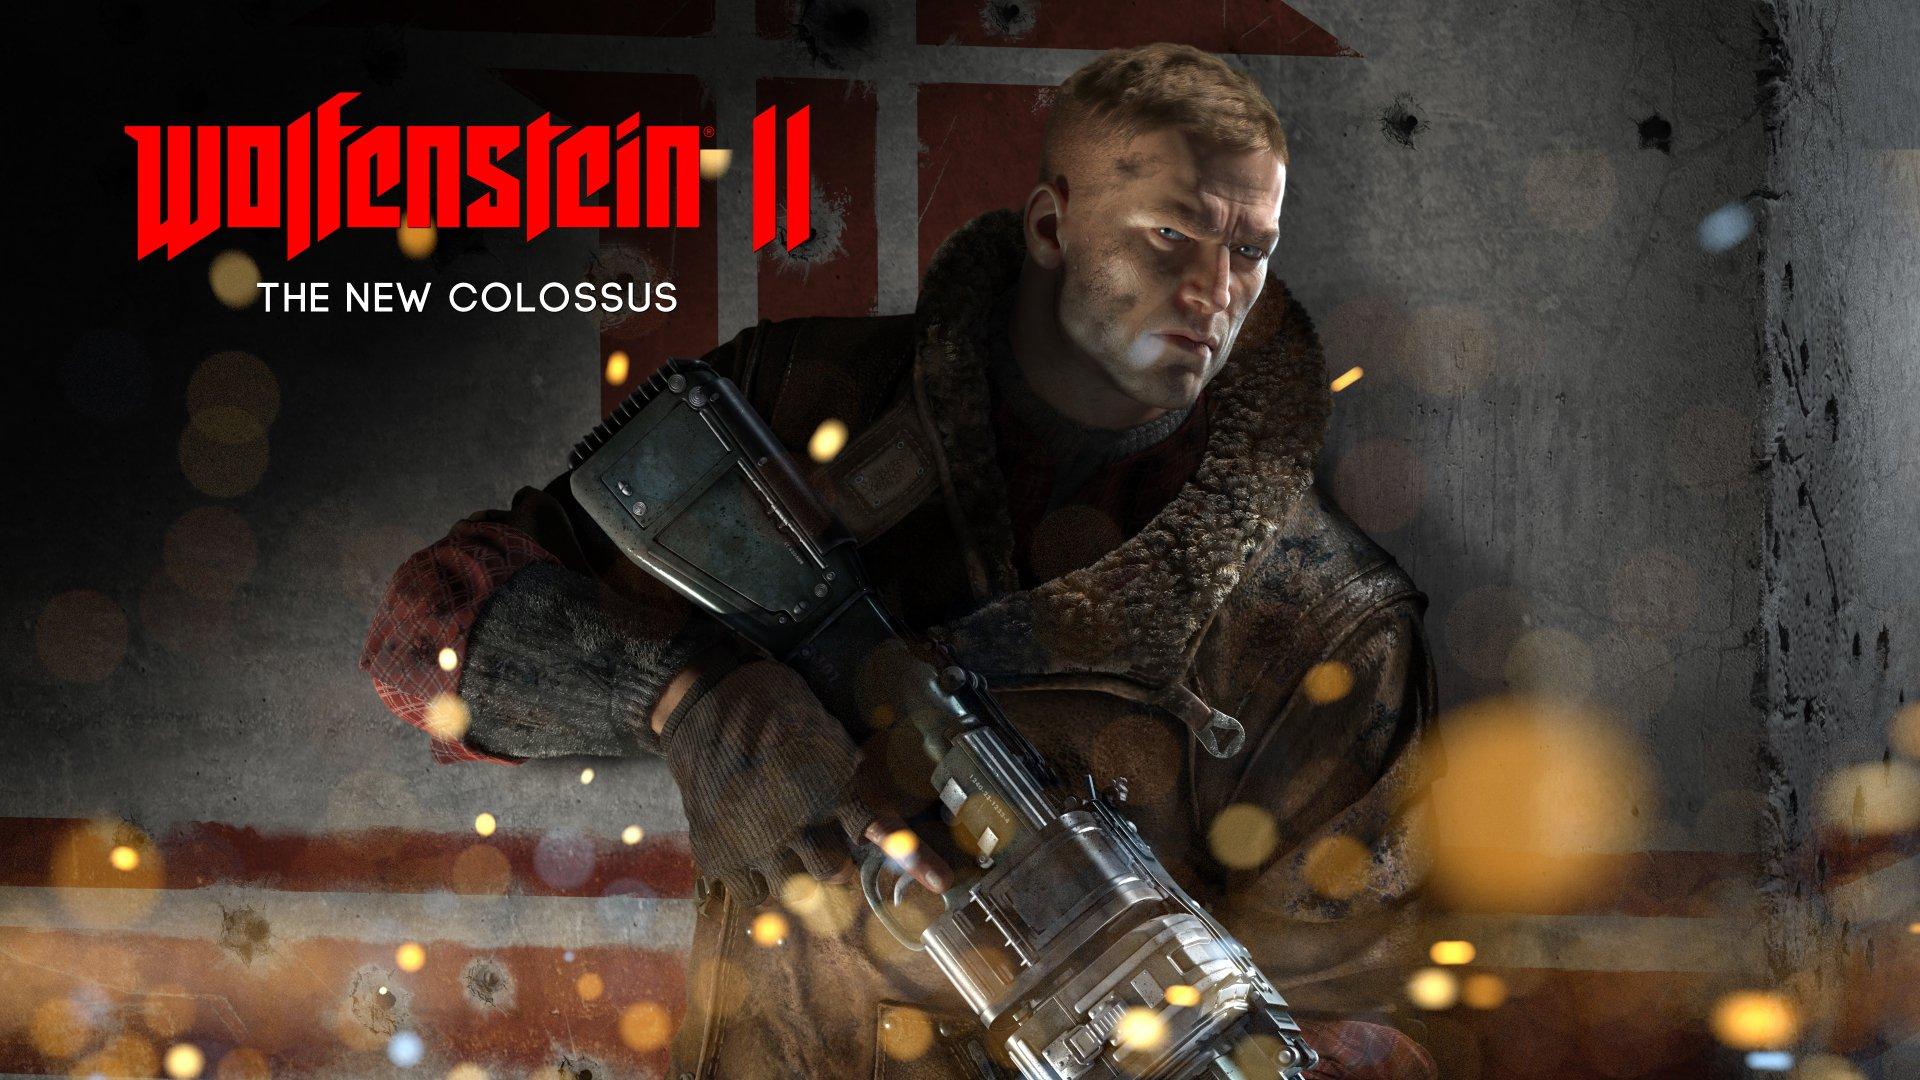 Video Game - Wolfenstein II: The New Colossus  B.J. Blazkowicz Wallpaper